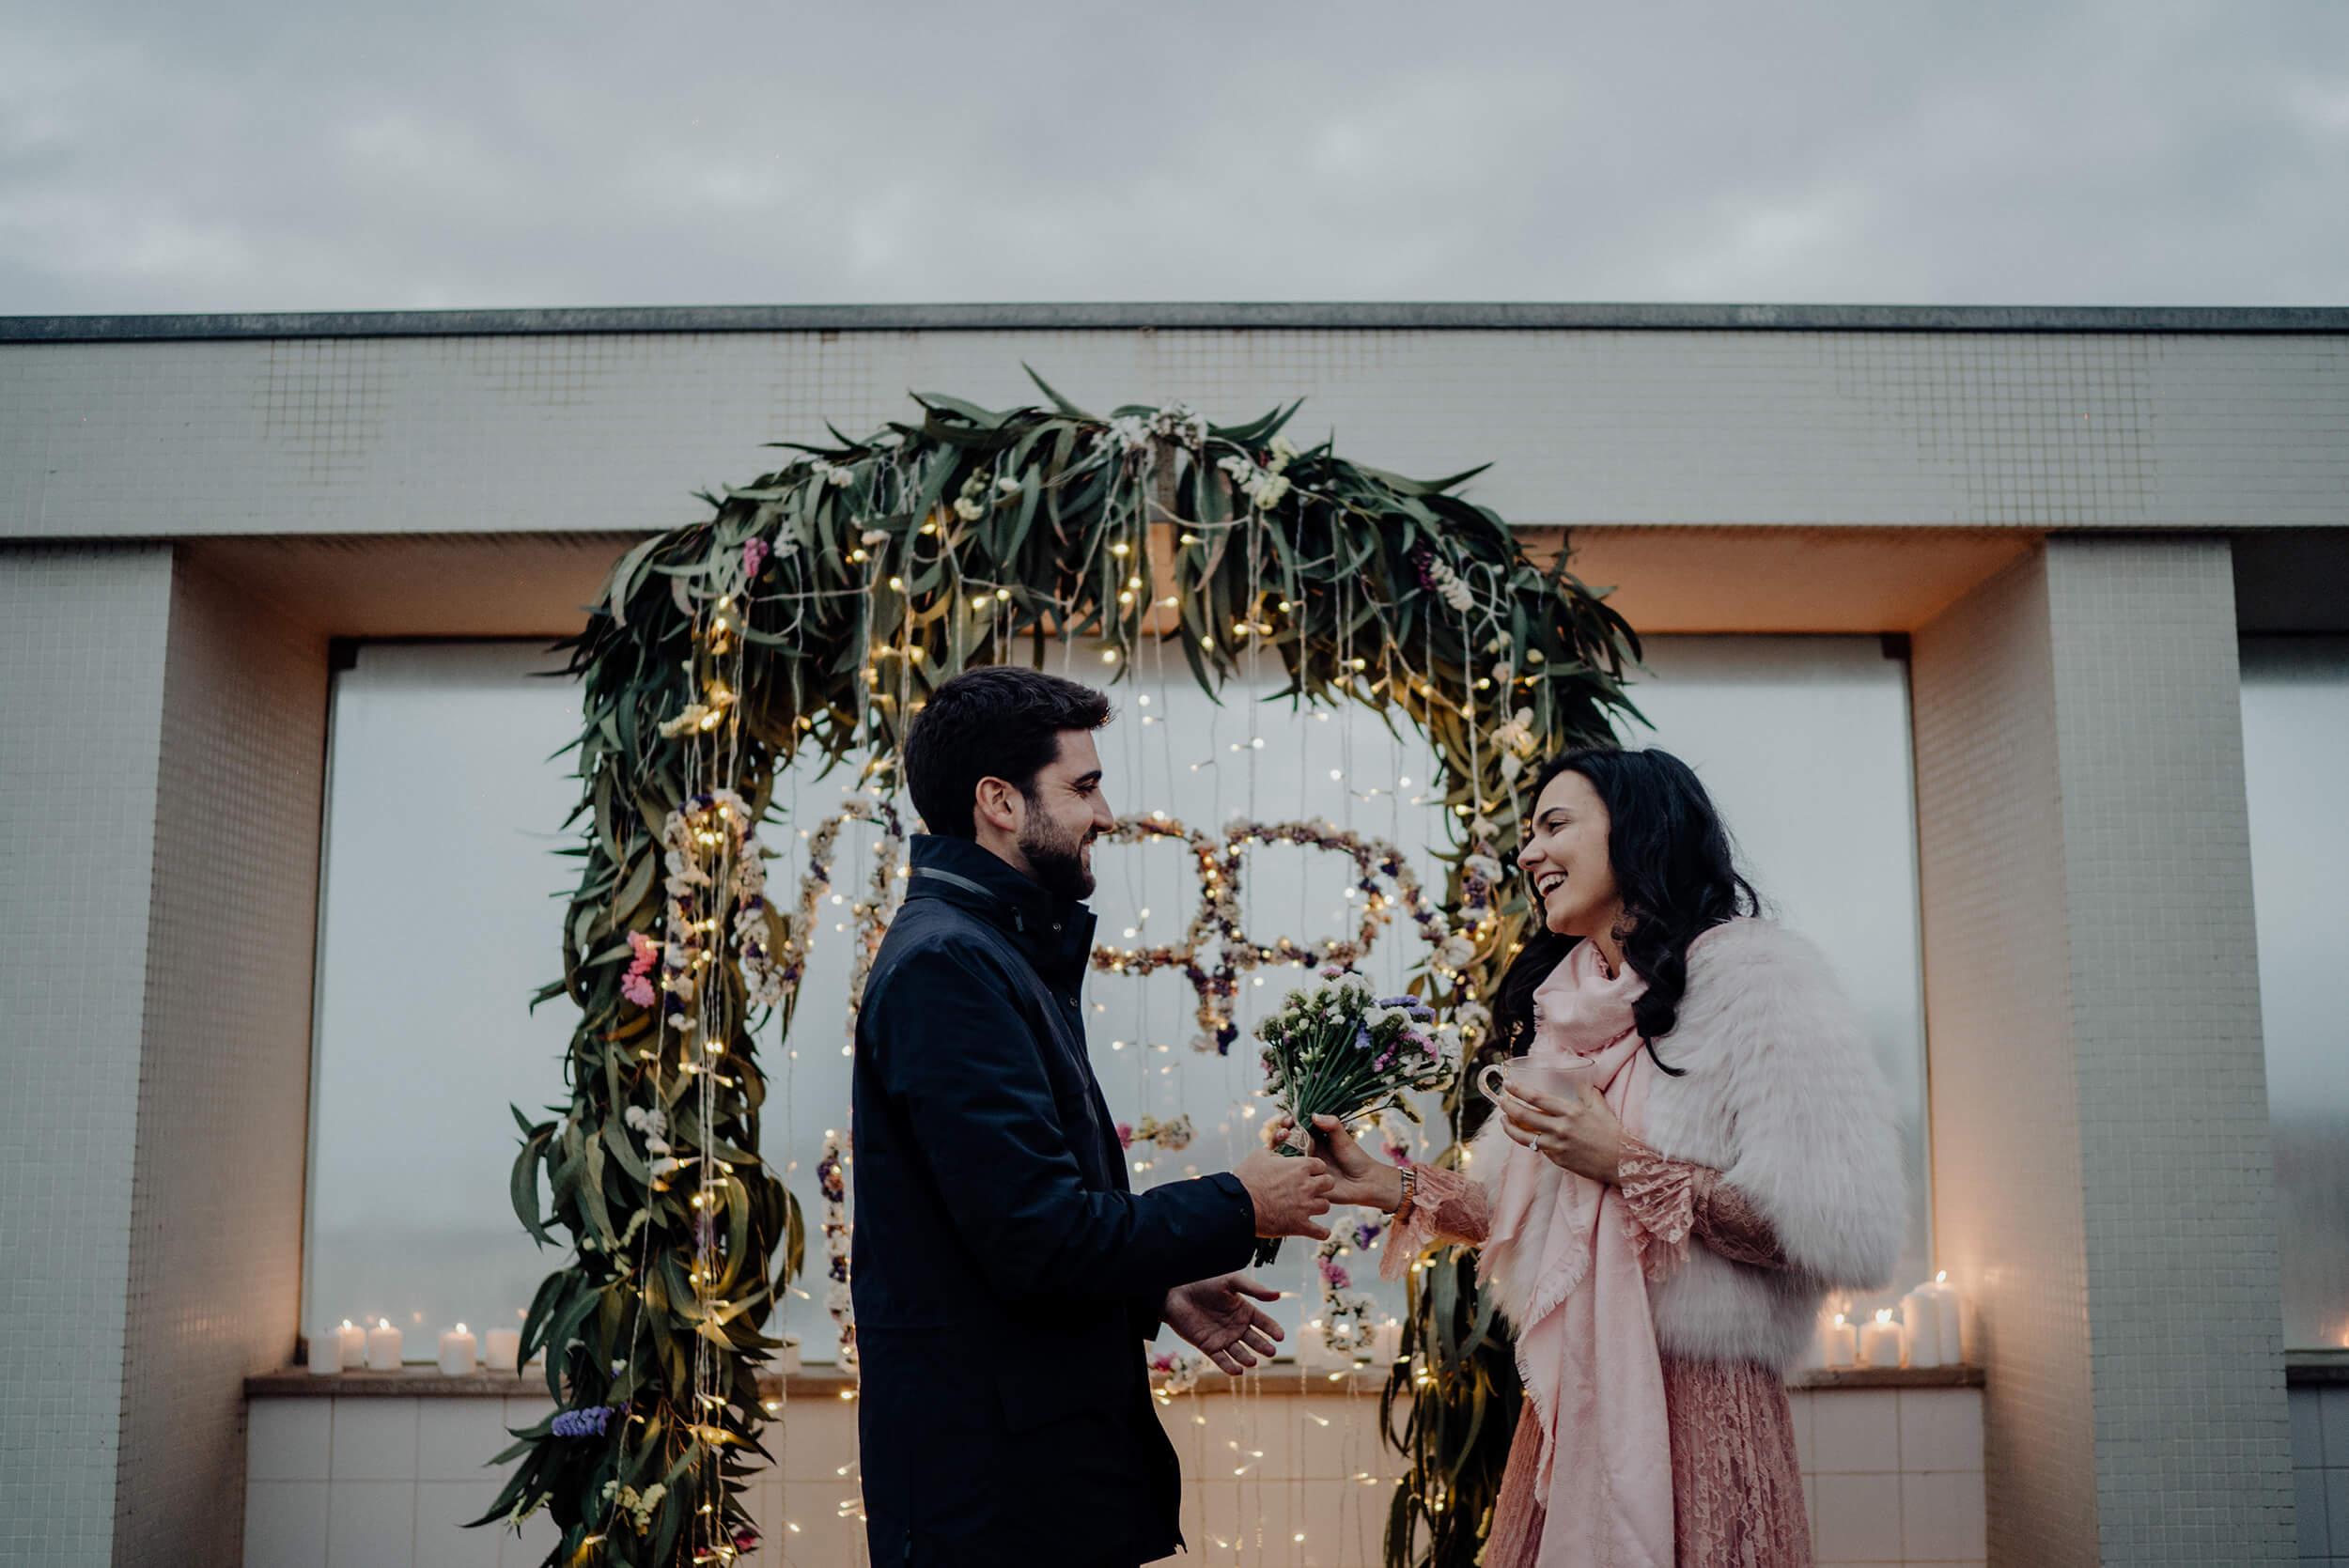 roma-organizacao-eventos-pedido-de-casamento-no-porto-33